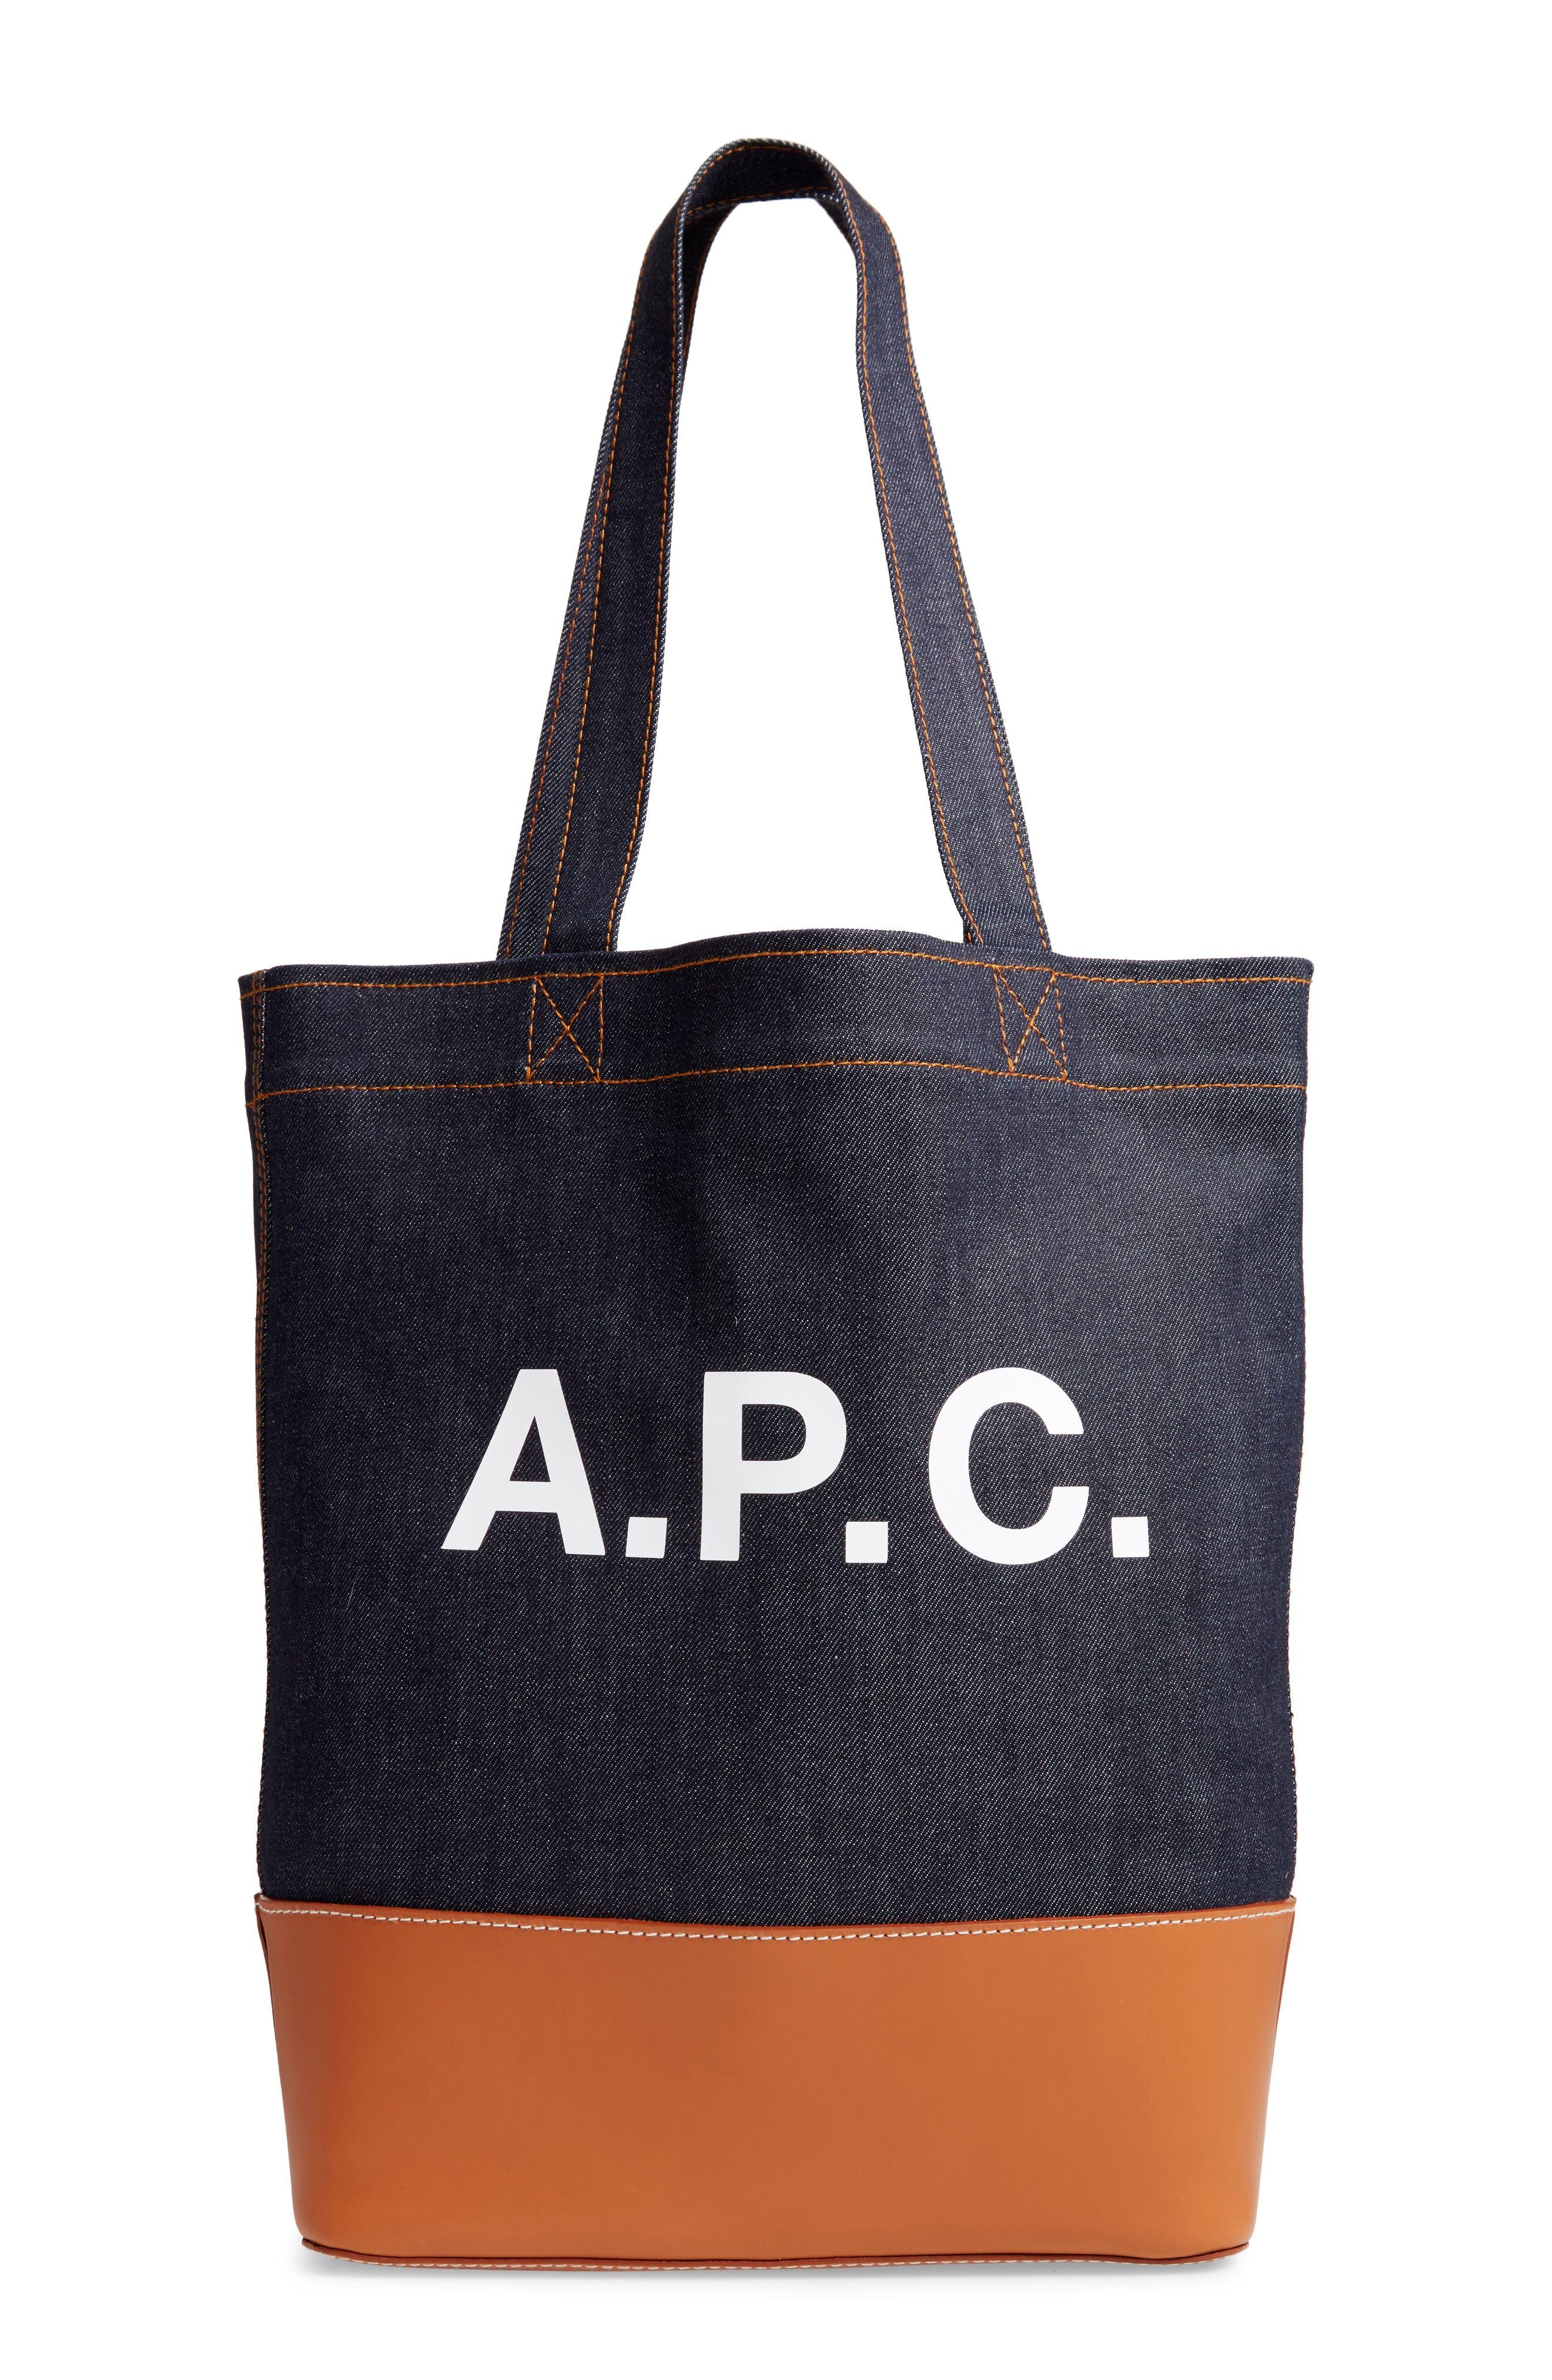 A.P.C. Axelle Denim & Leather Tote, Main, color, 200